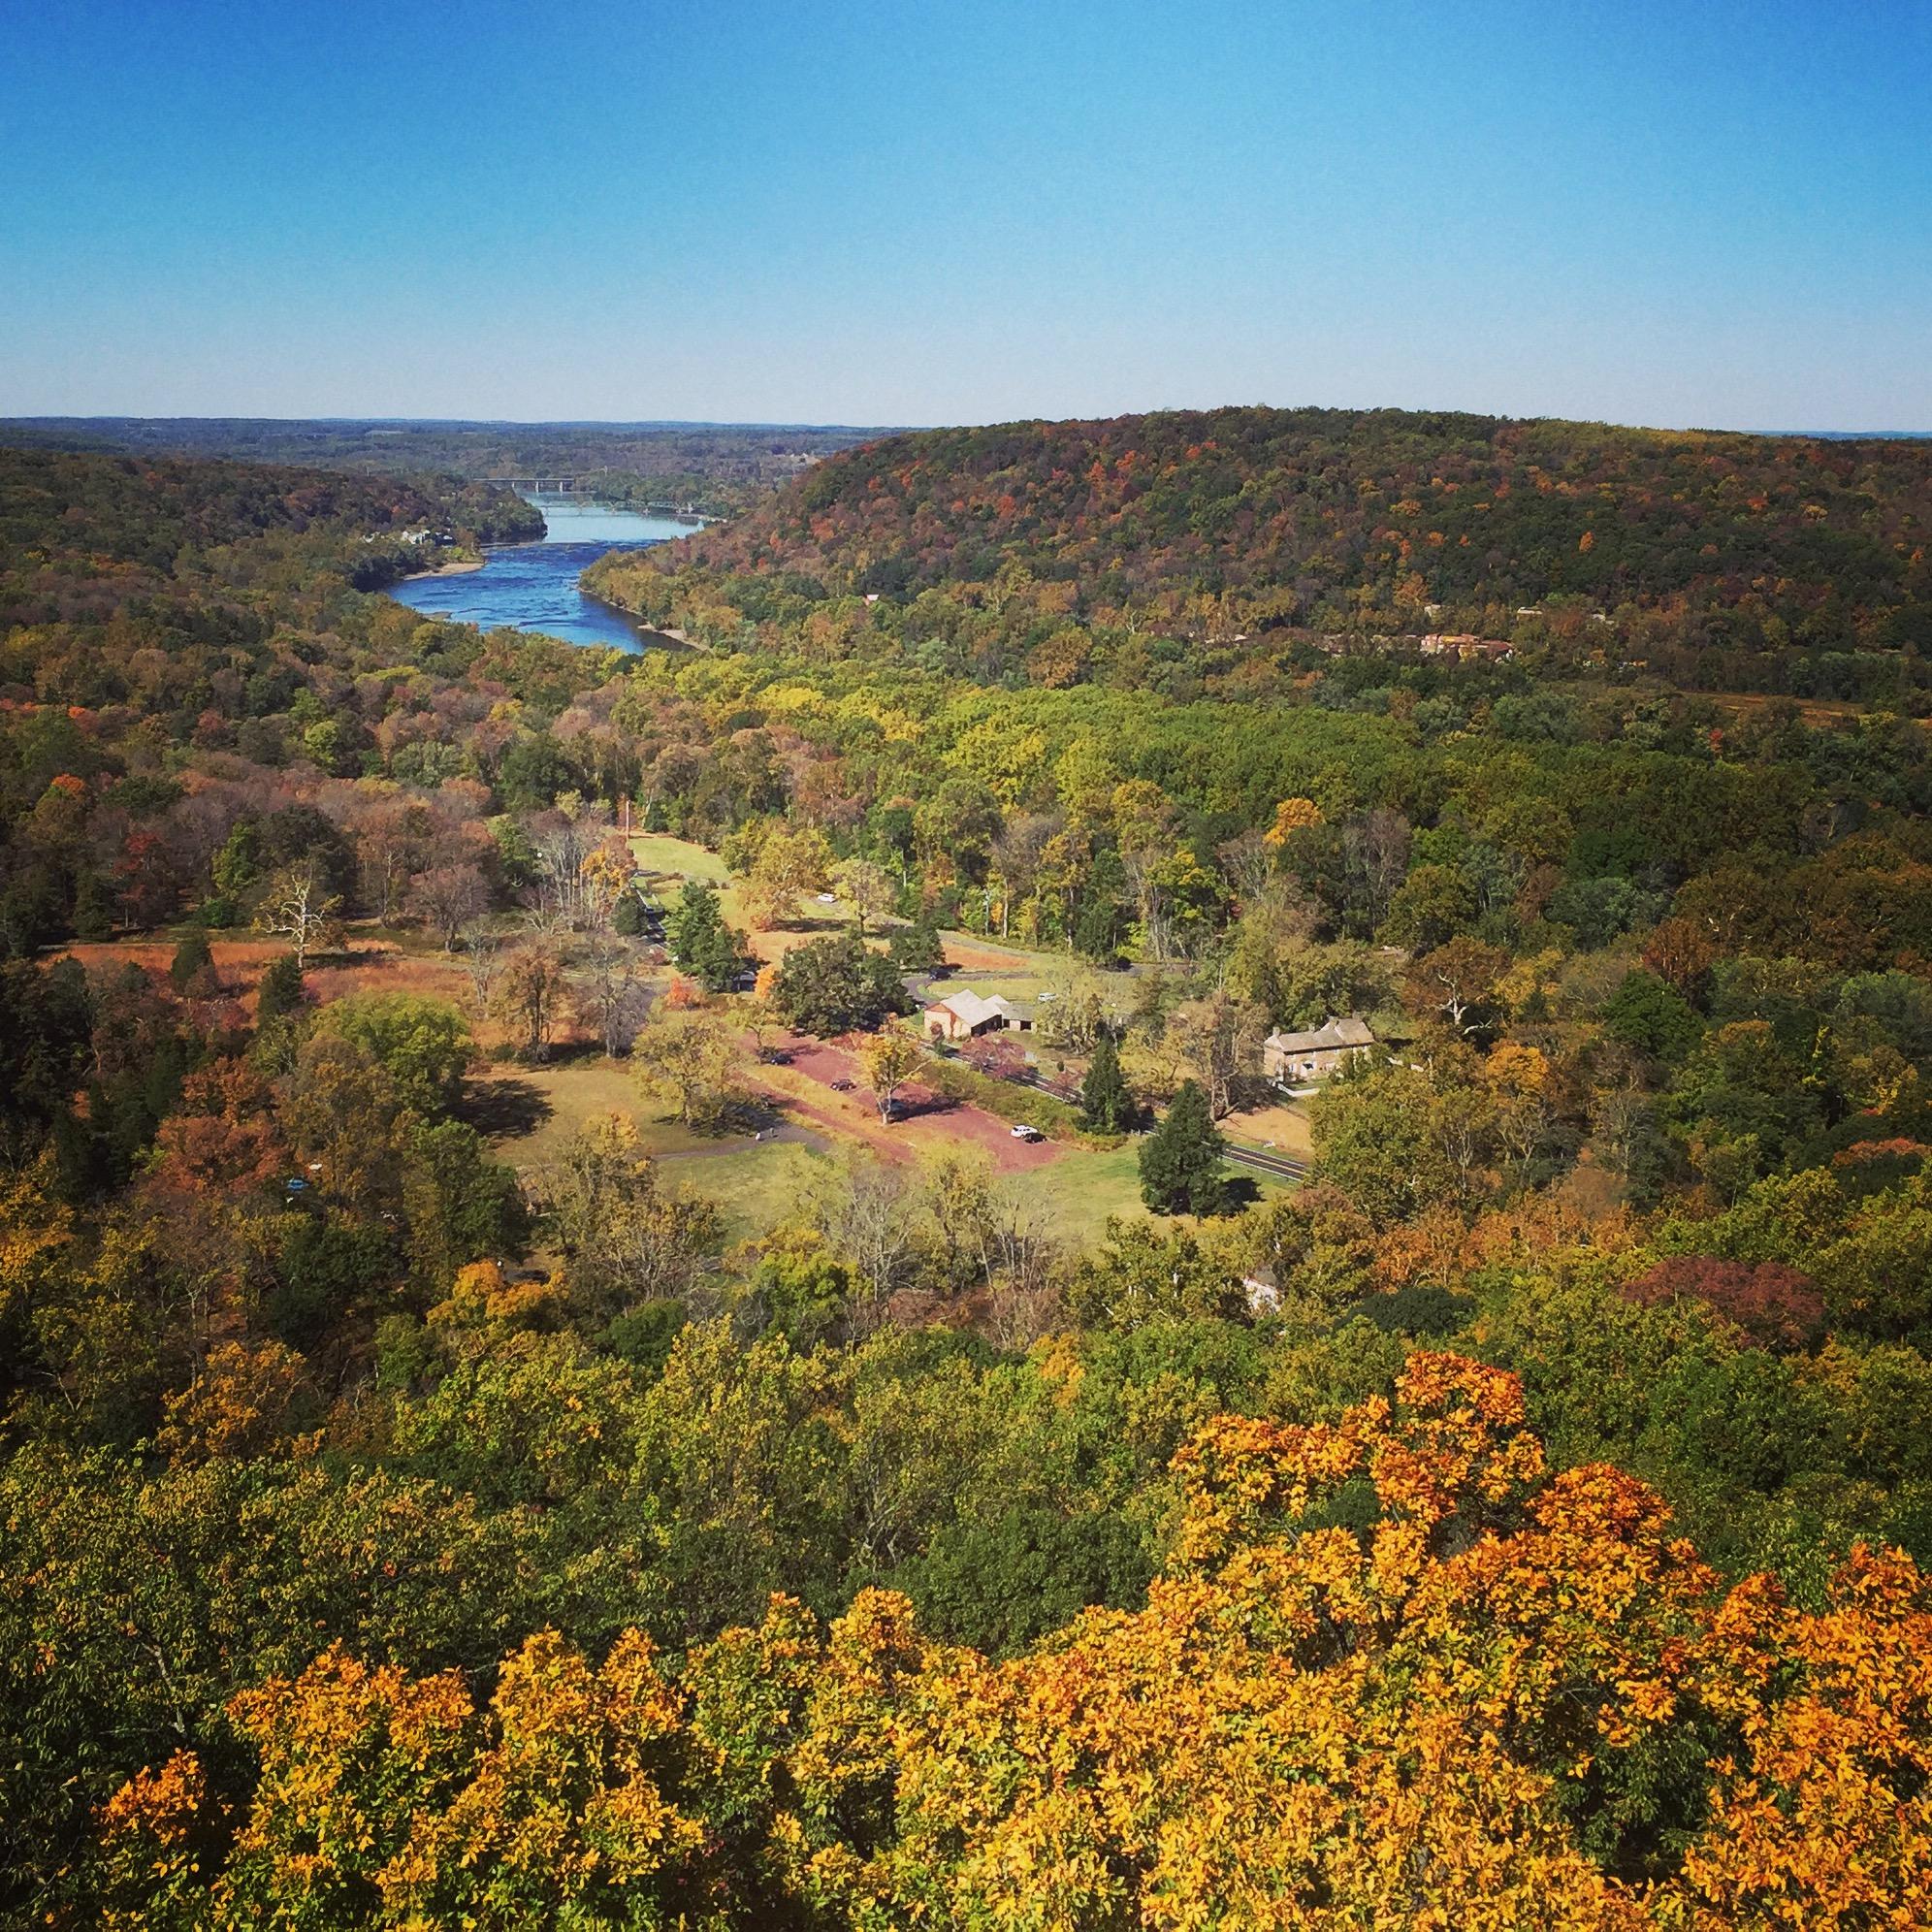 4 Amazing Spots For Viewing Fall Foliage Near Philadelphia